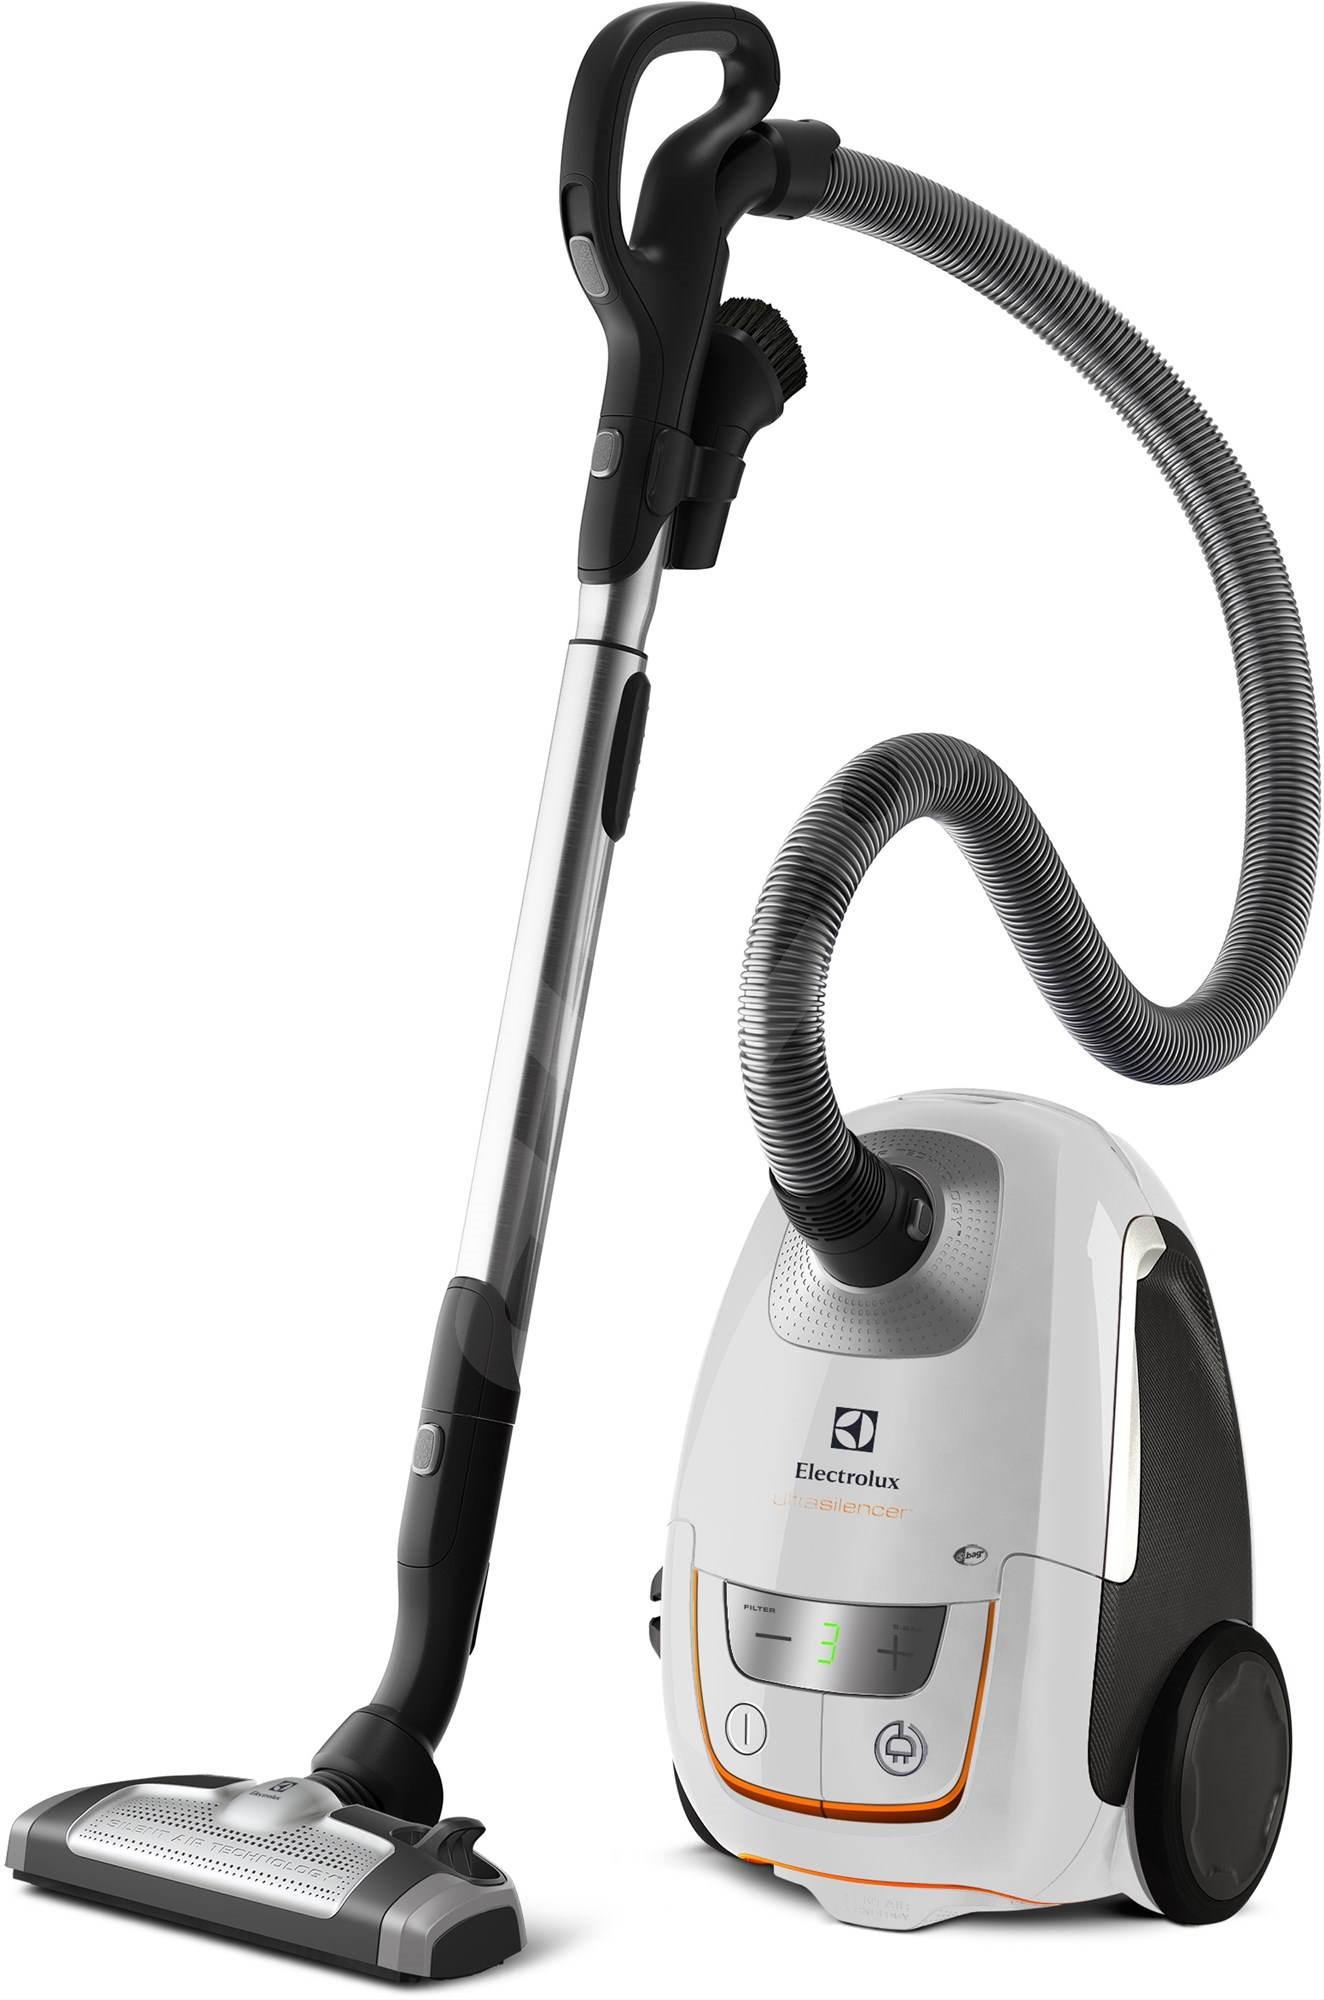 Electrolux ZUSANIMAL - Vacuum Cleaner | Alzashop.com